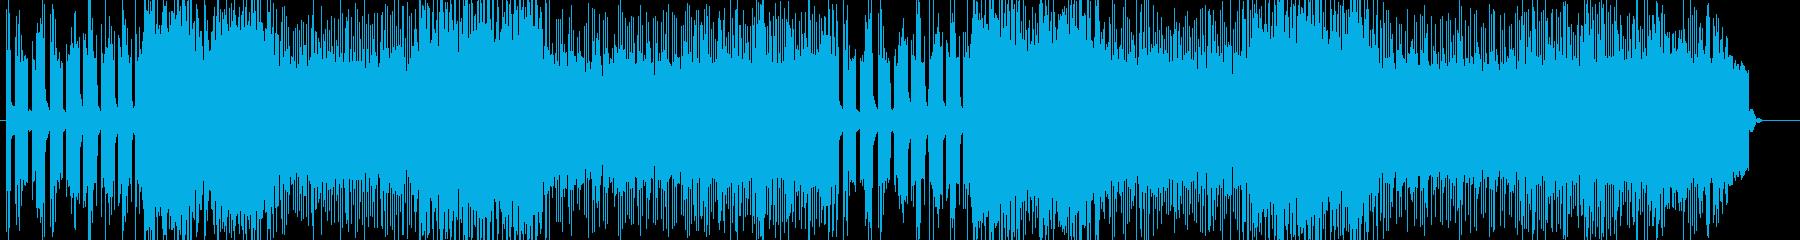 「HR/HM」「SLASH」BGM172の再生済みの波形